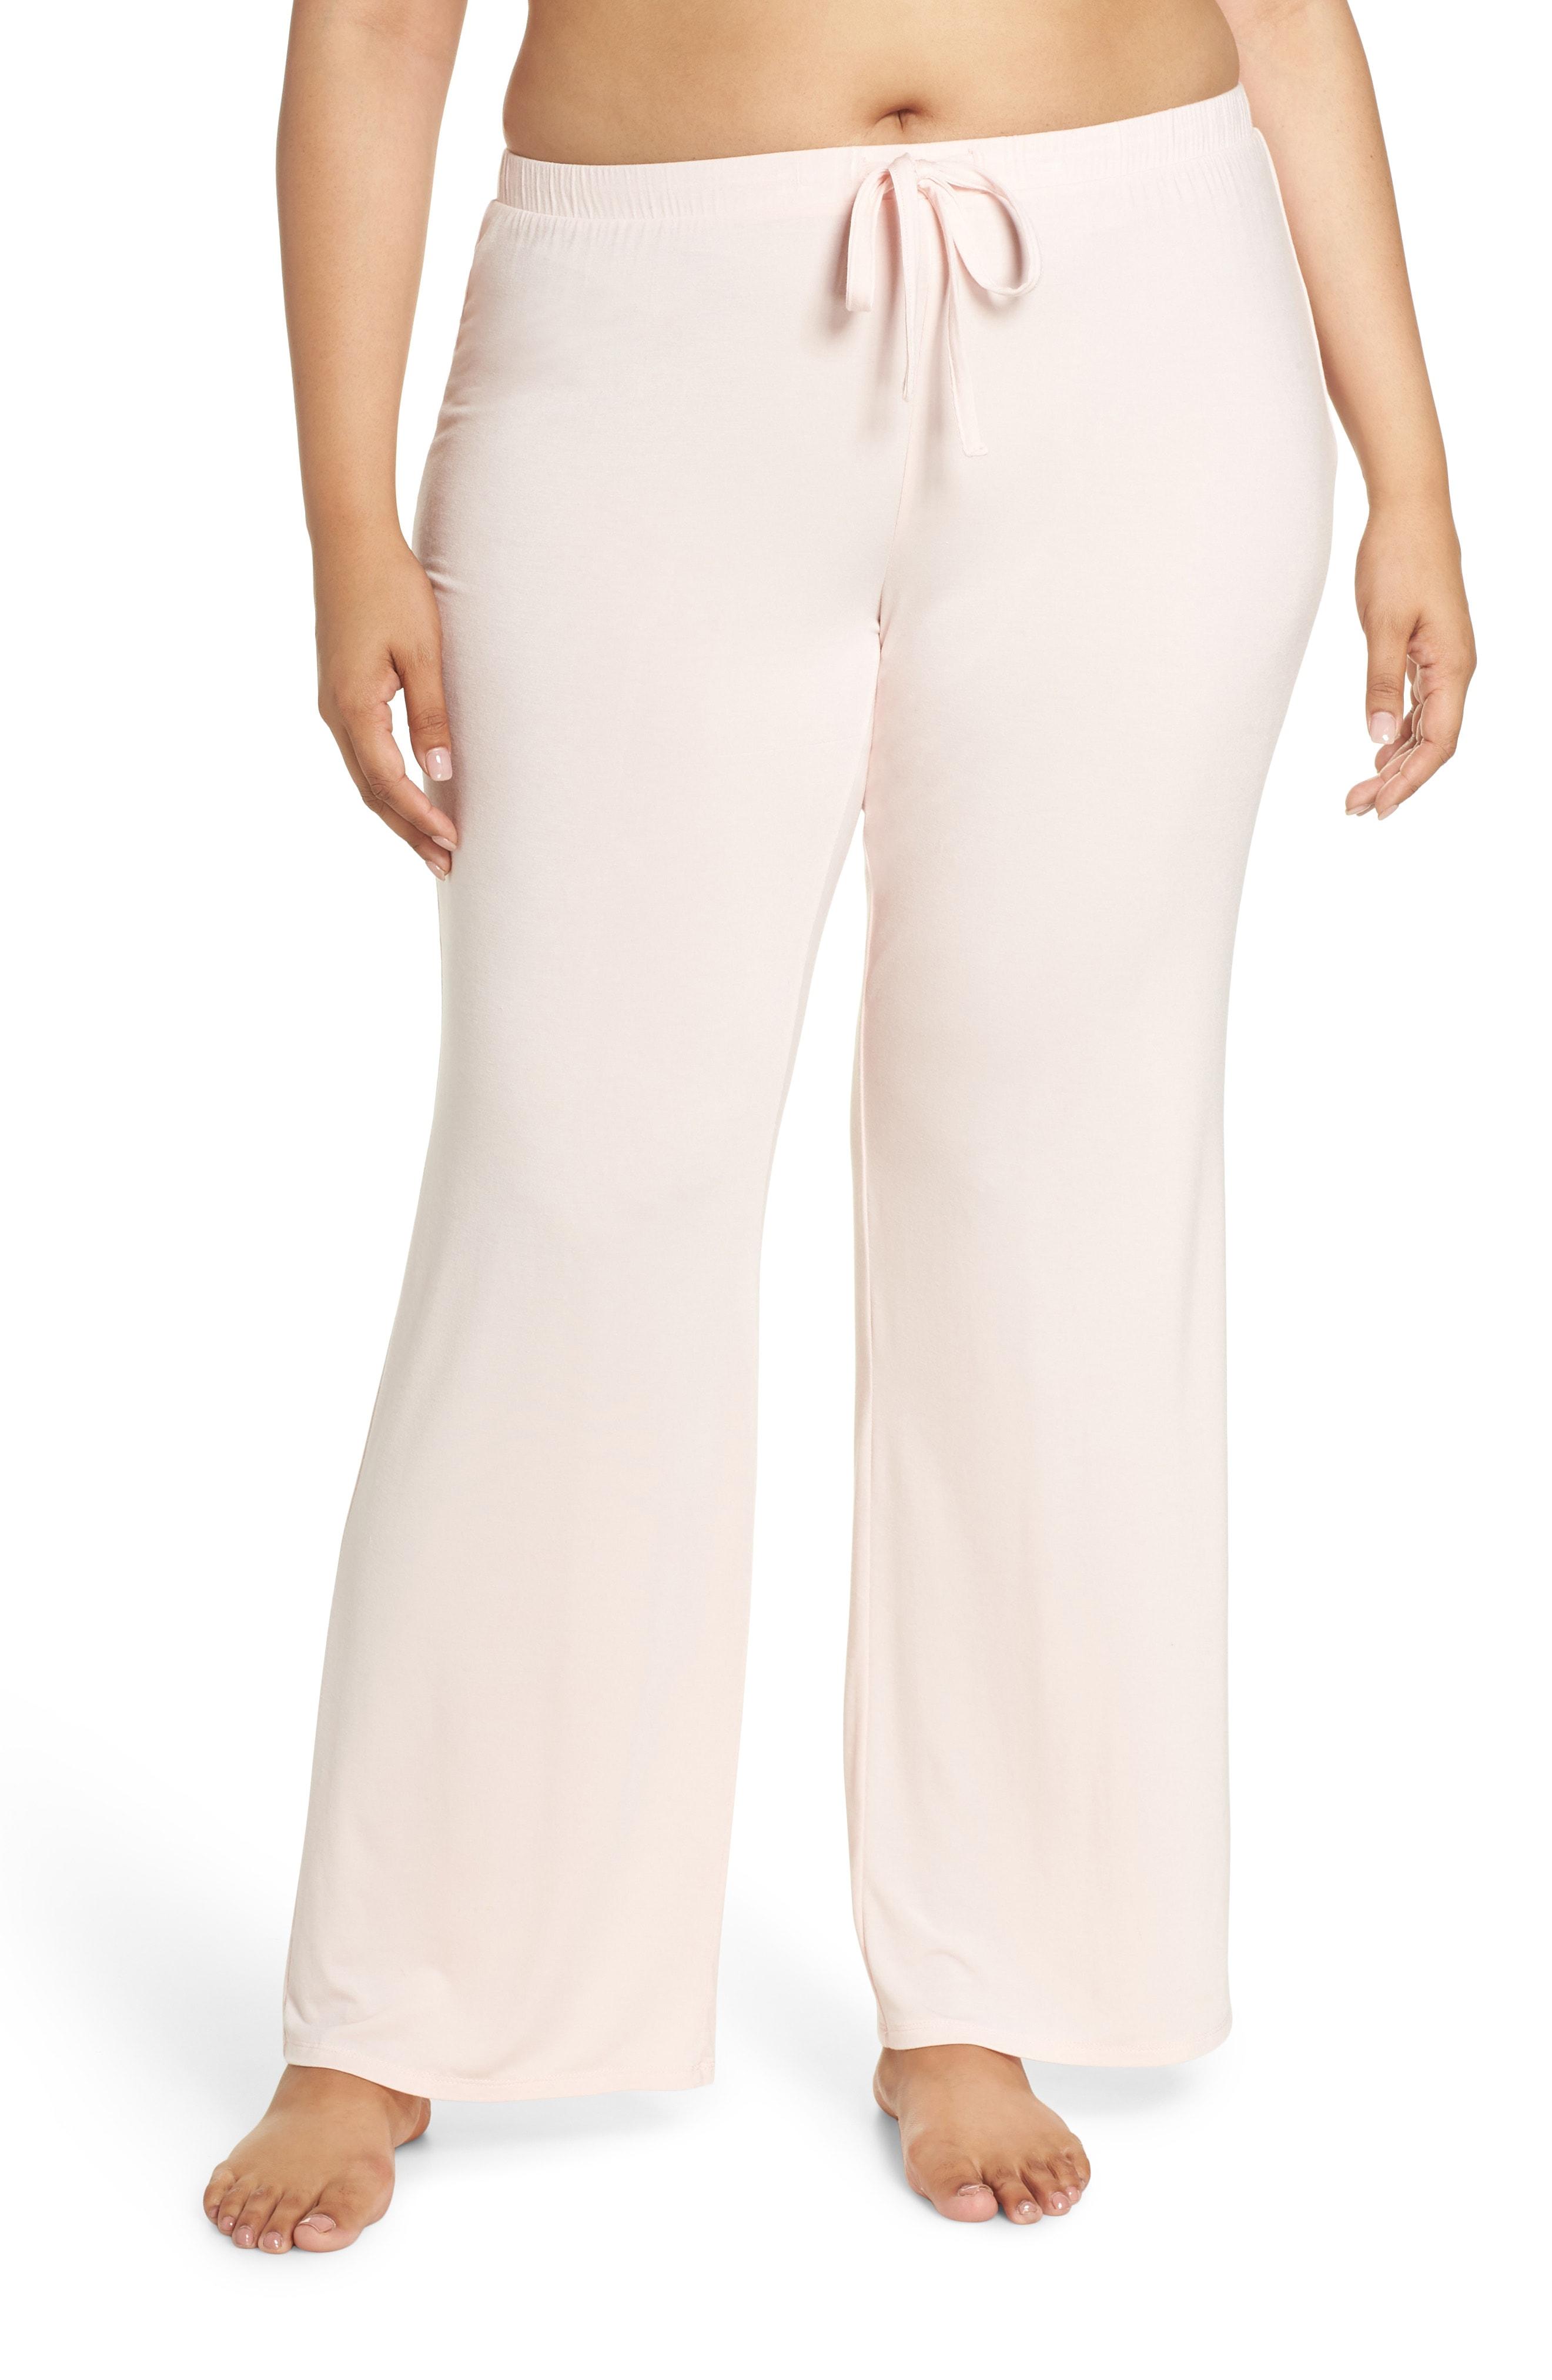 Nordstrom Lingerie Breathe Lounge Pants (Plus Size) (2 for $75)